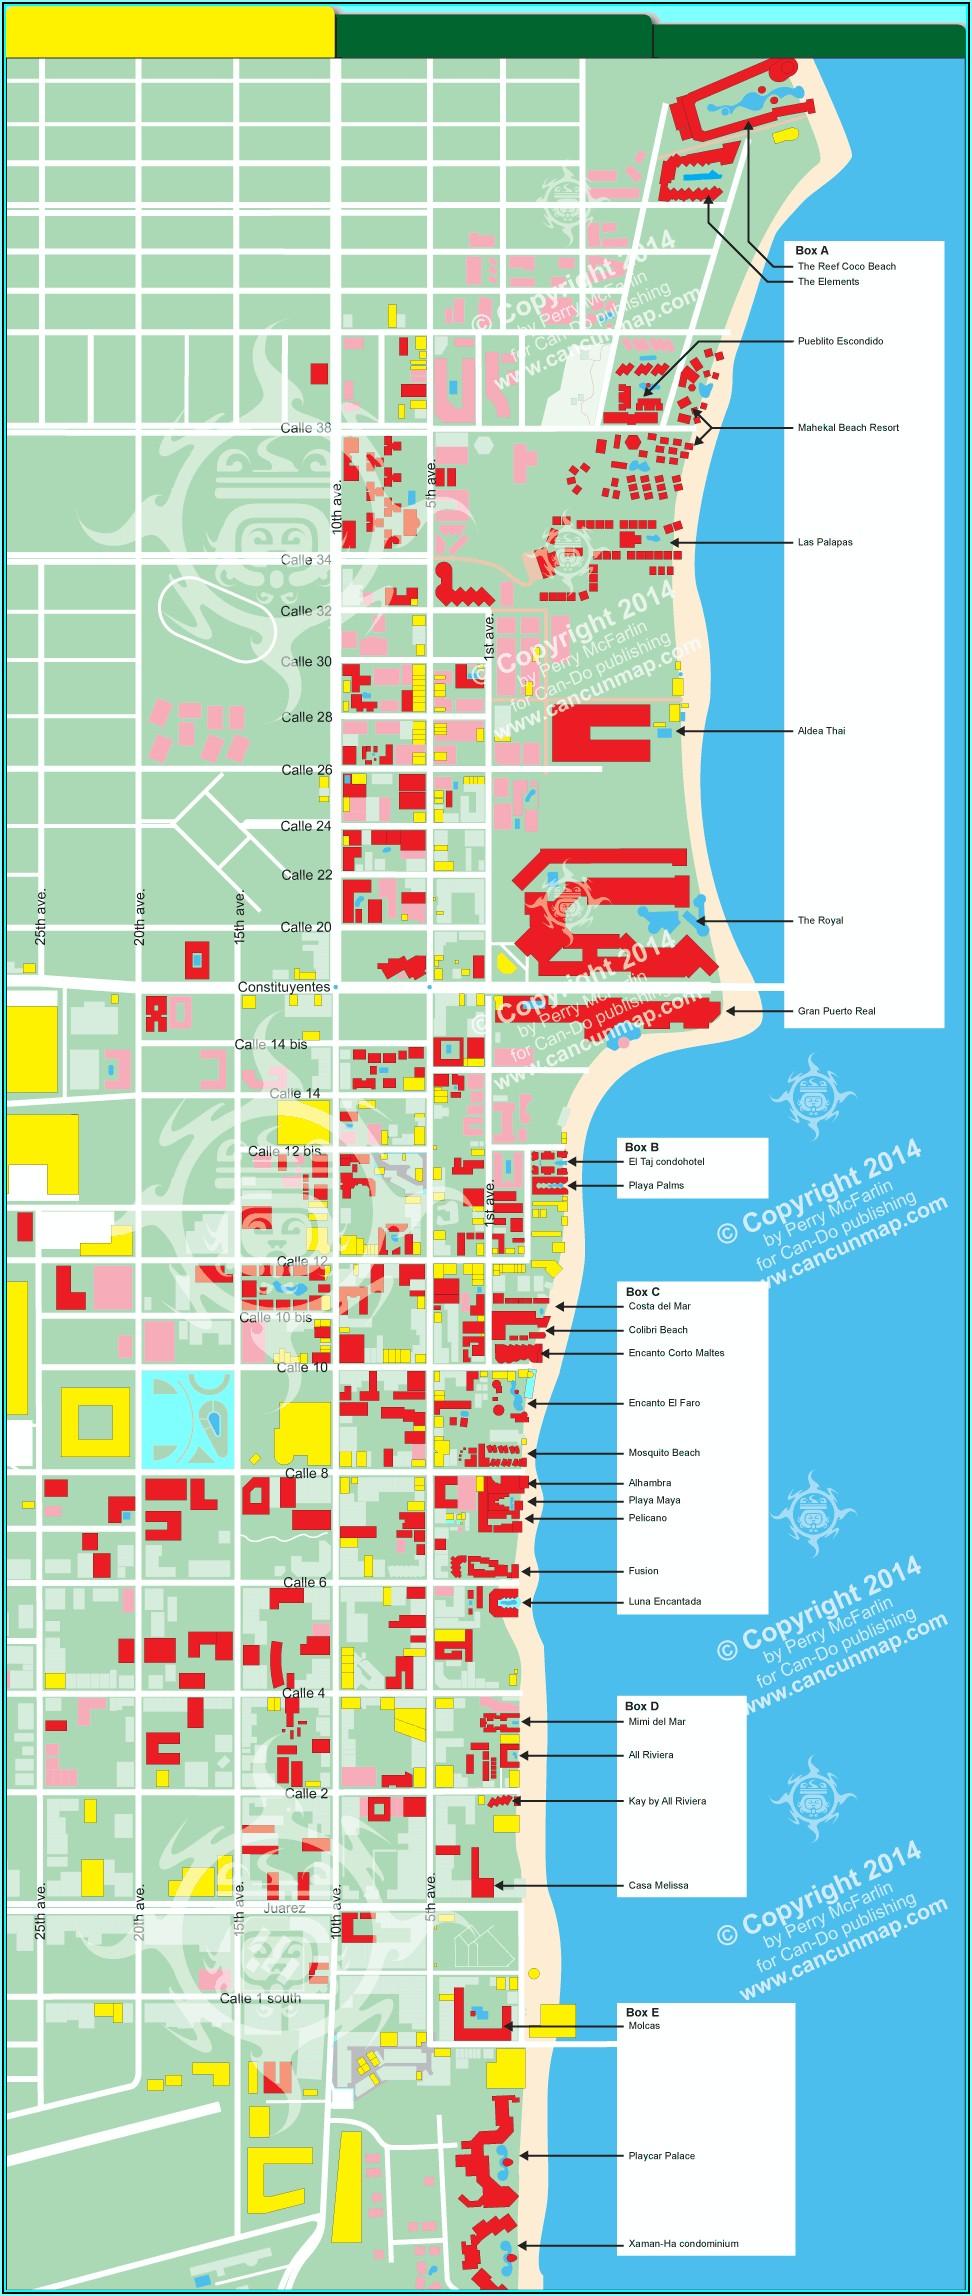 Playa Del Carmen Mexico Map Of Hotels